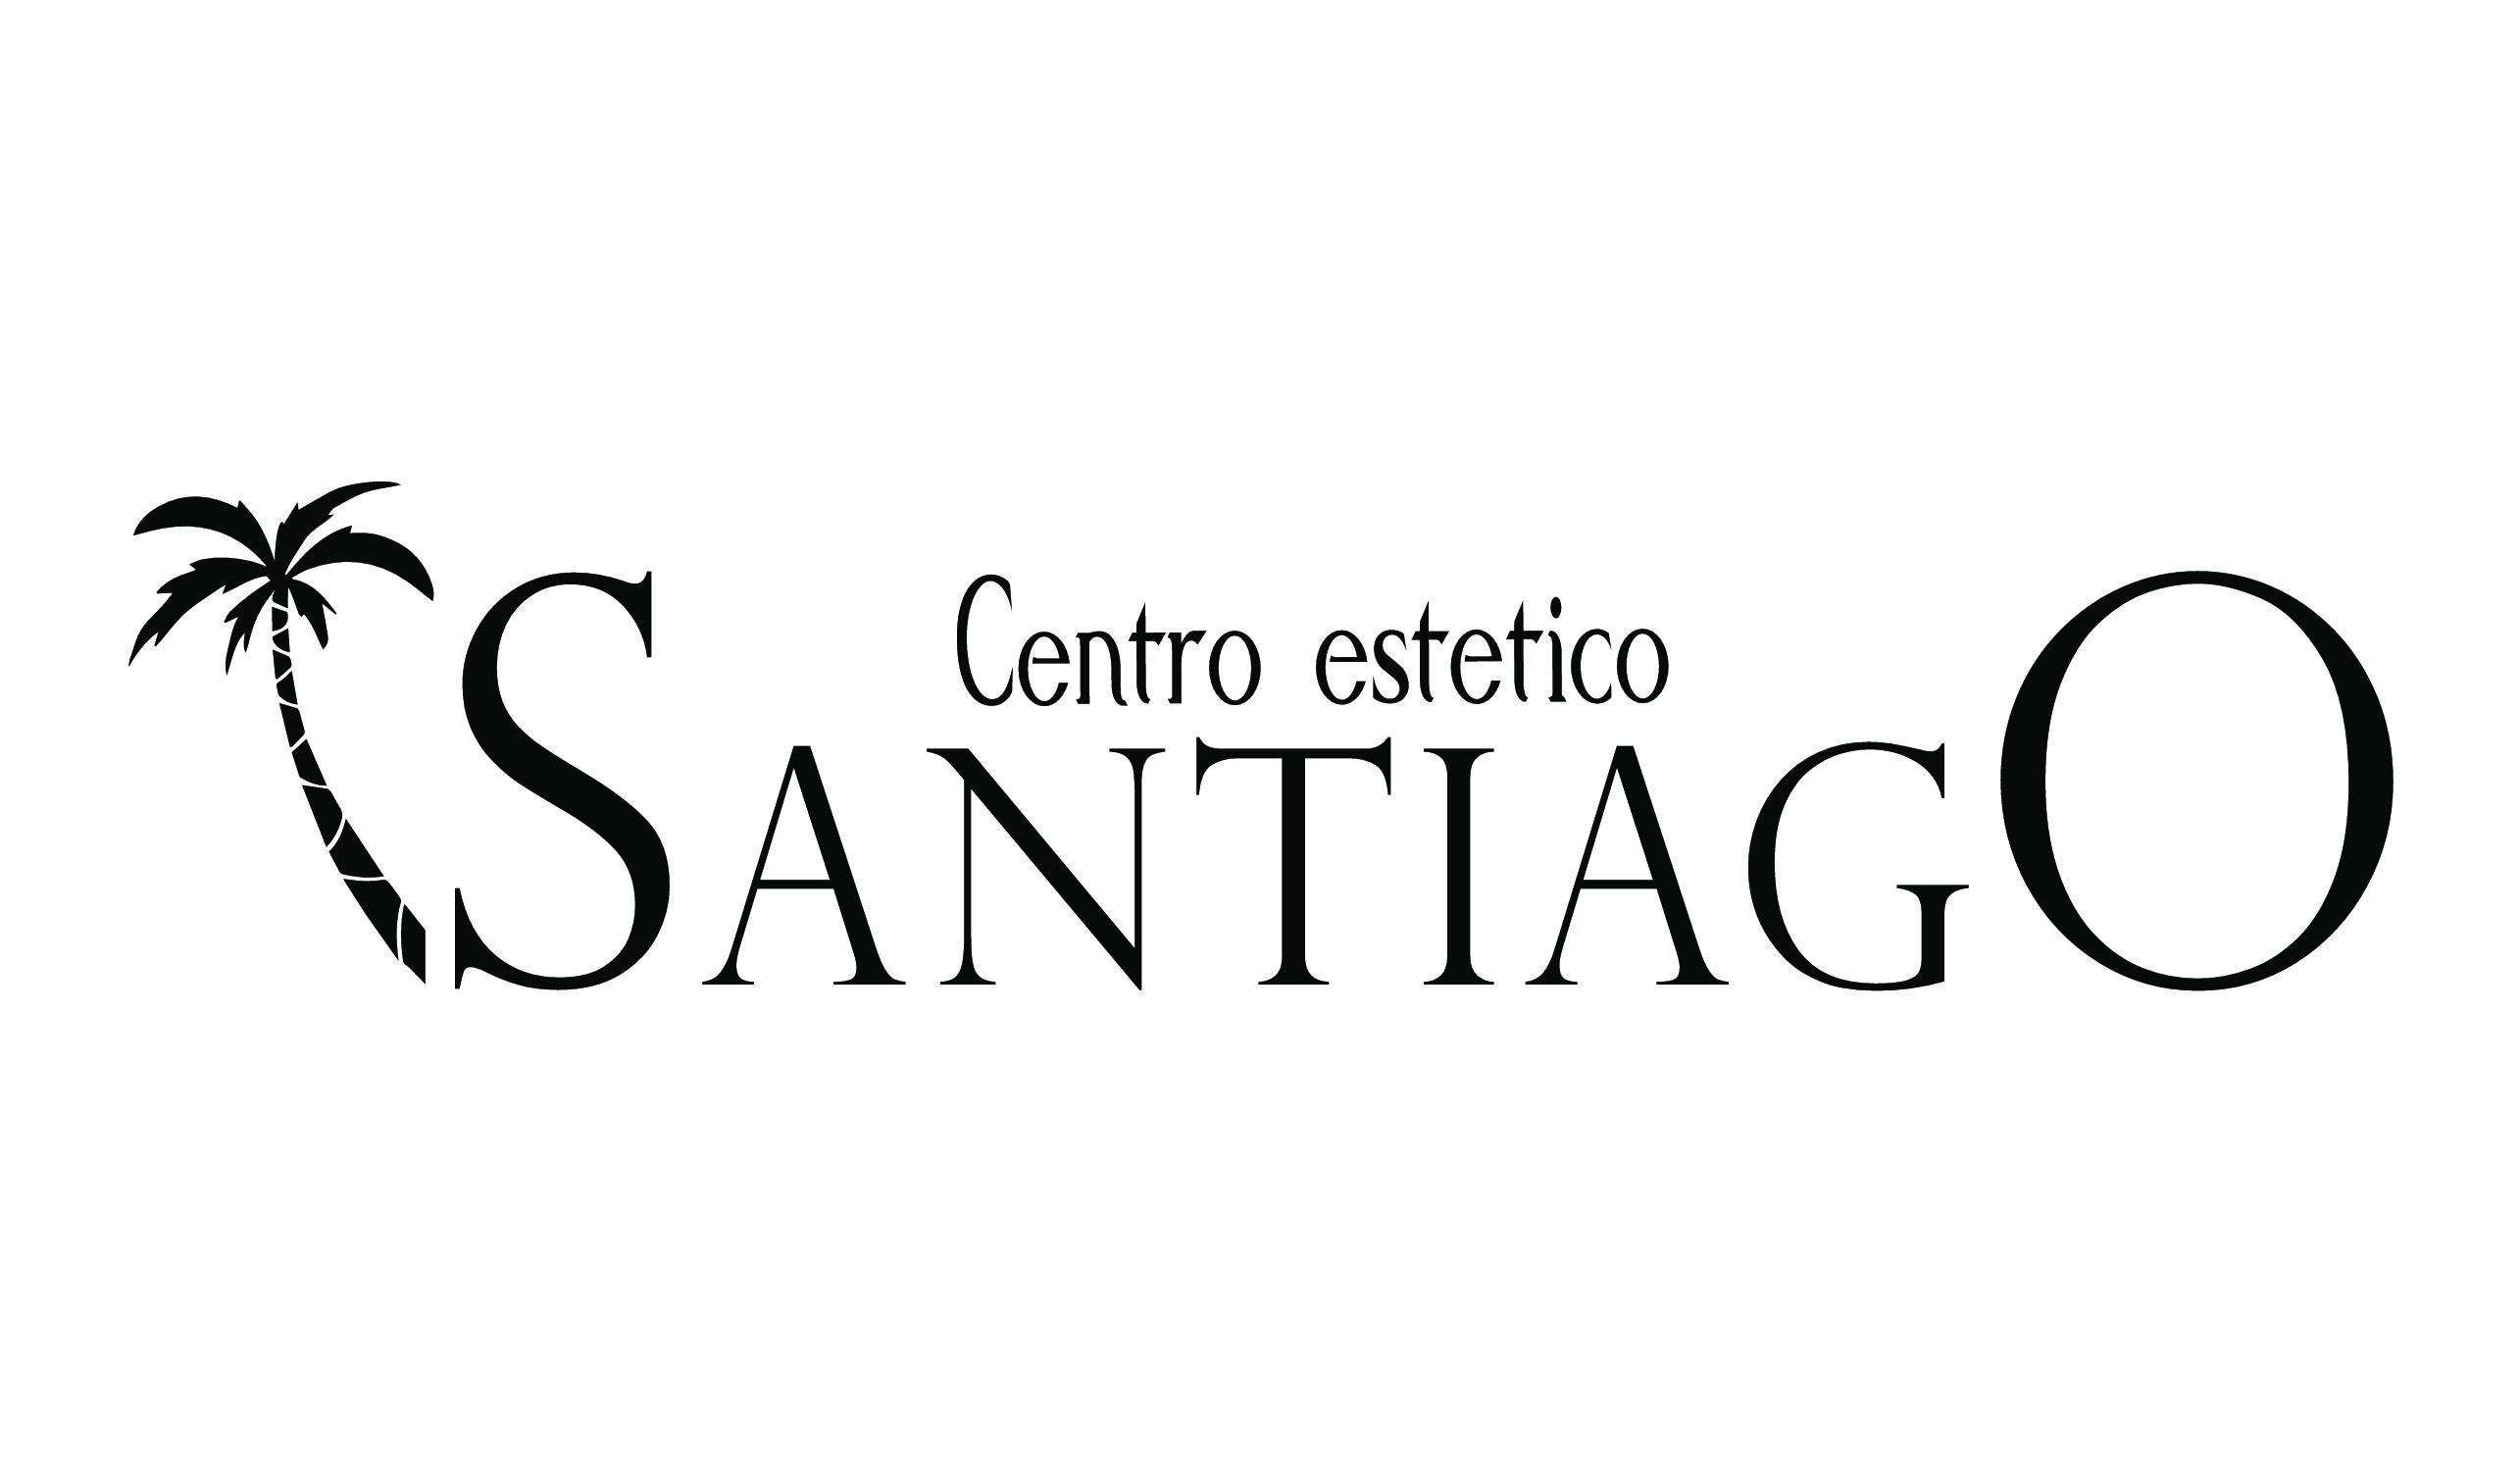 CENTRO ESTETICO SANTIAGO